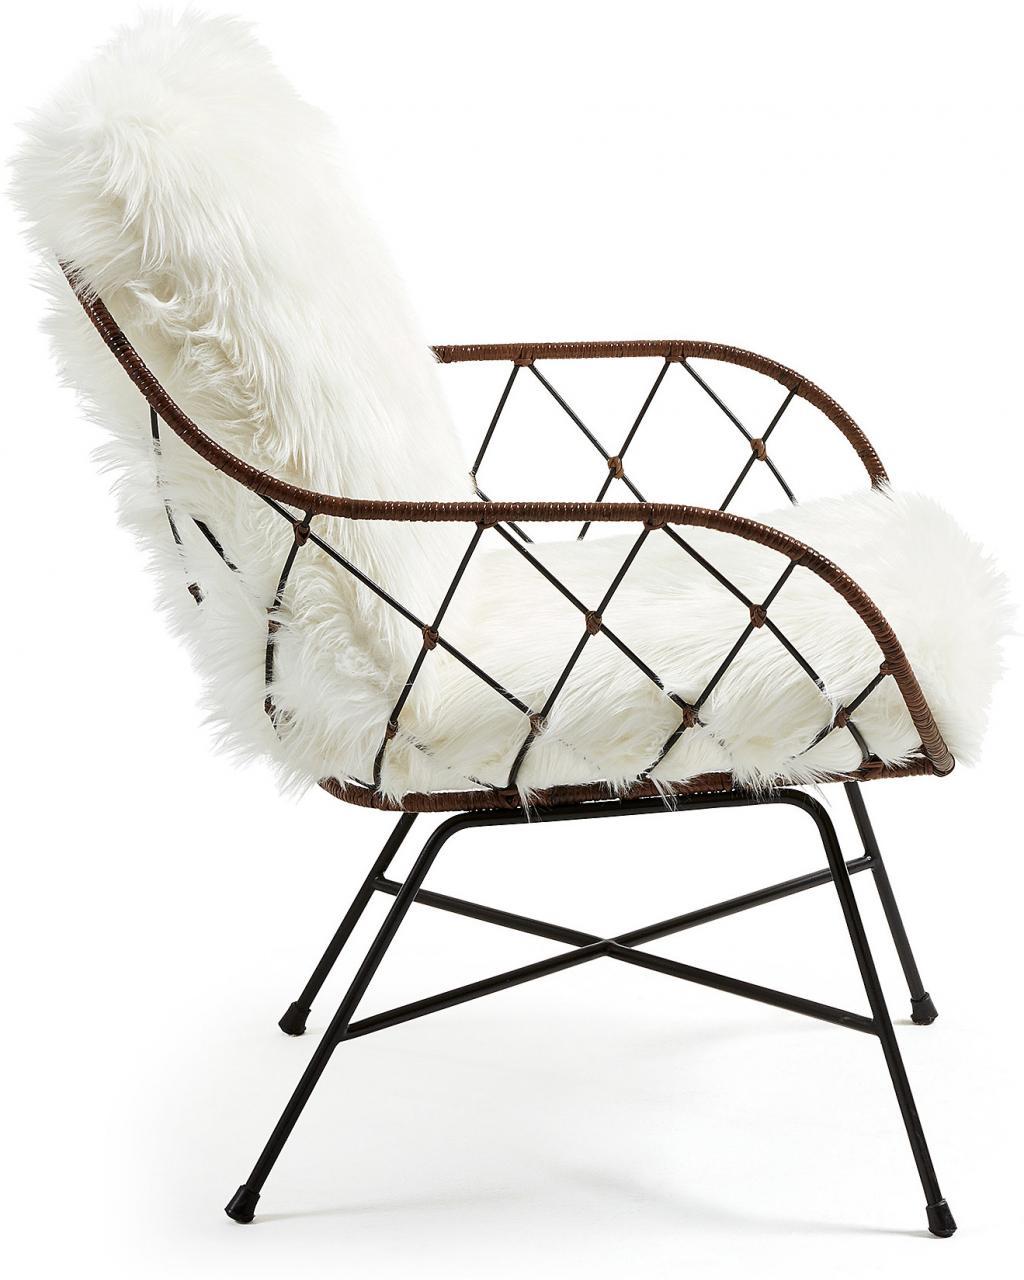 stuhl claque metall rattan kunstpelz wei la forma kaufen wohn und. Black Bedroom Furniture Sets. Home Design Ideas